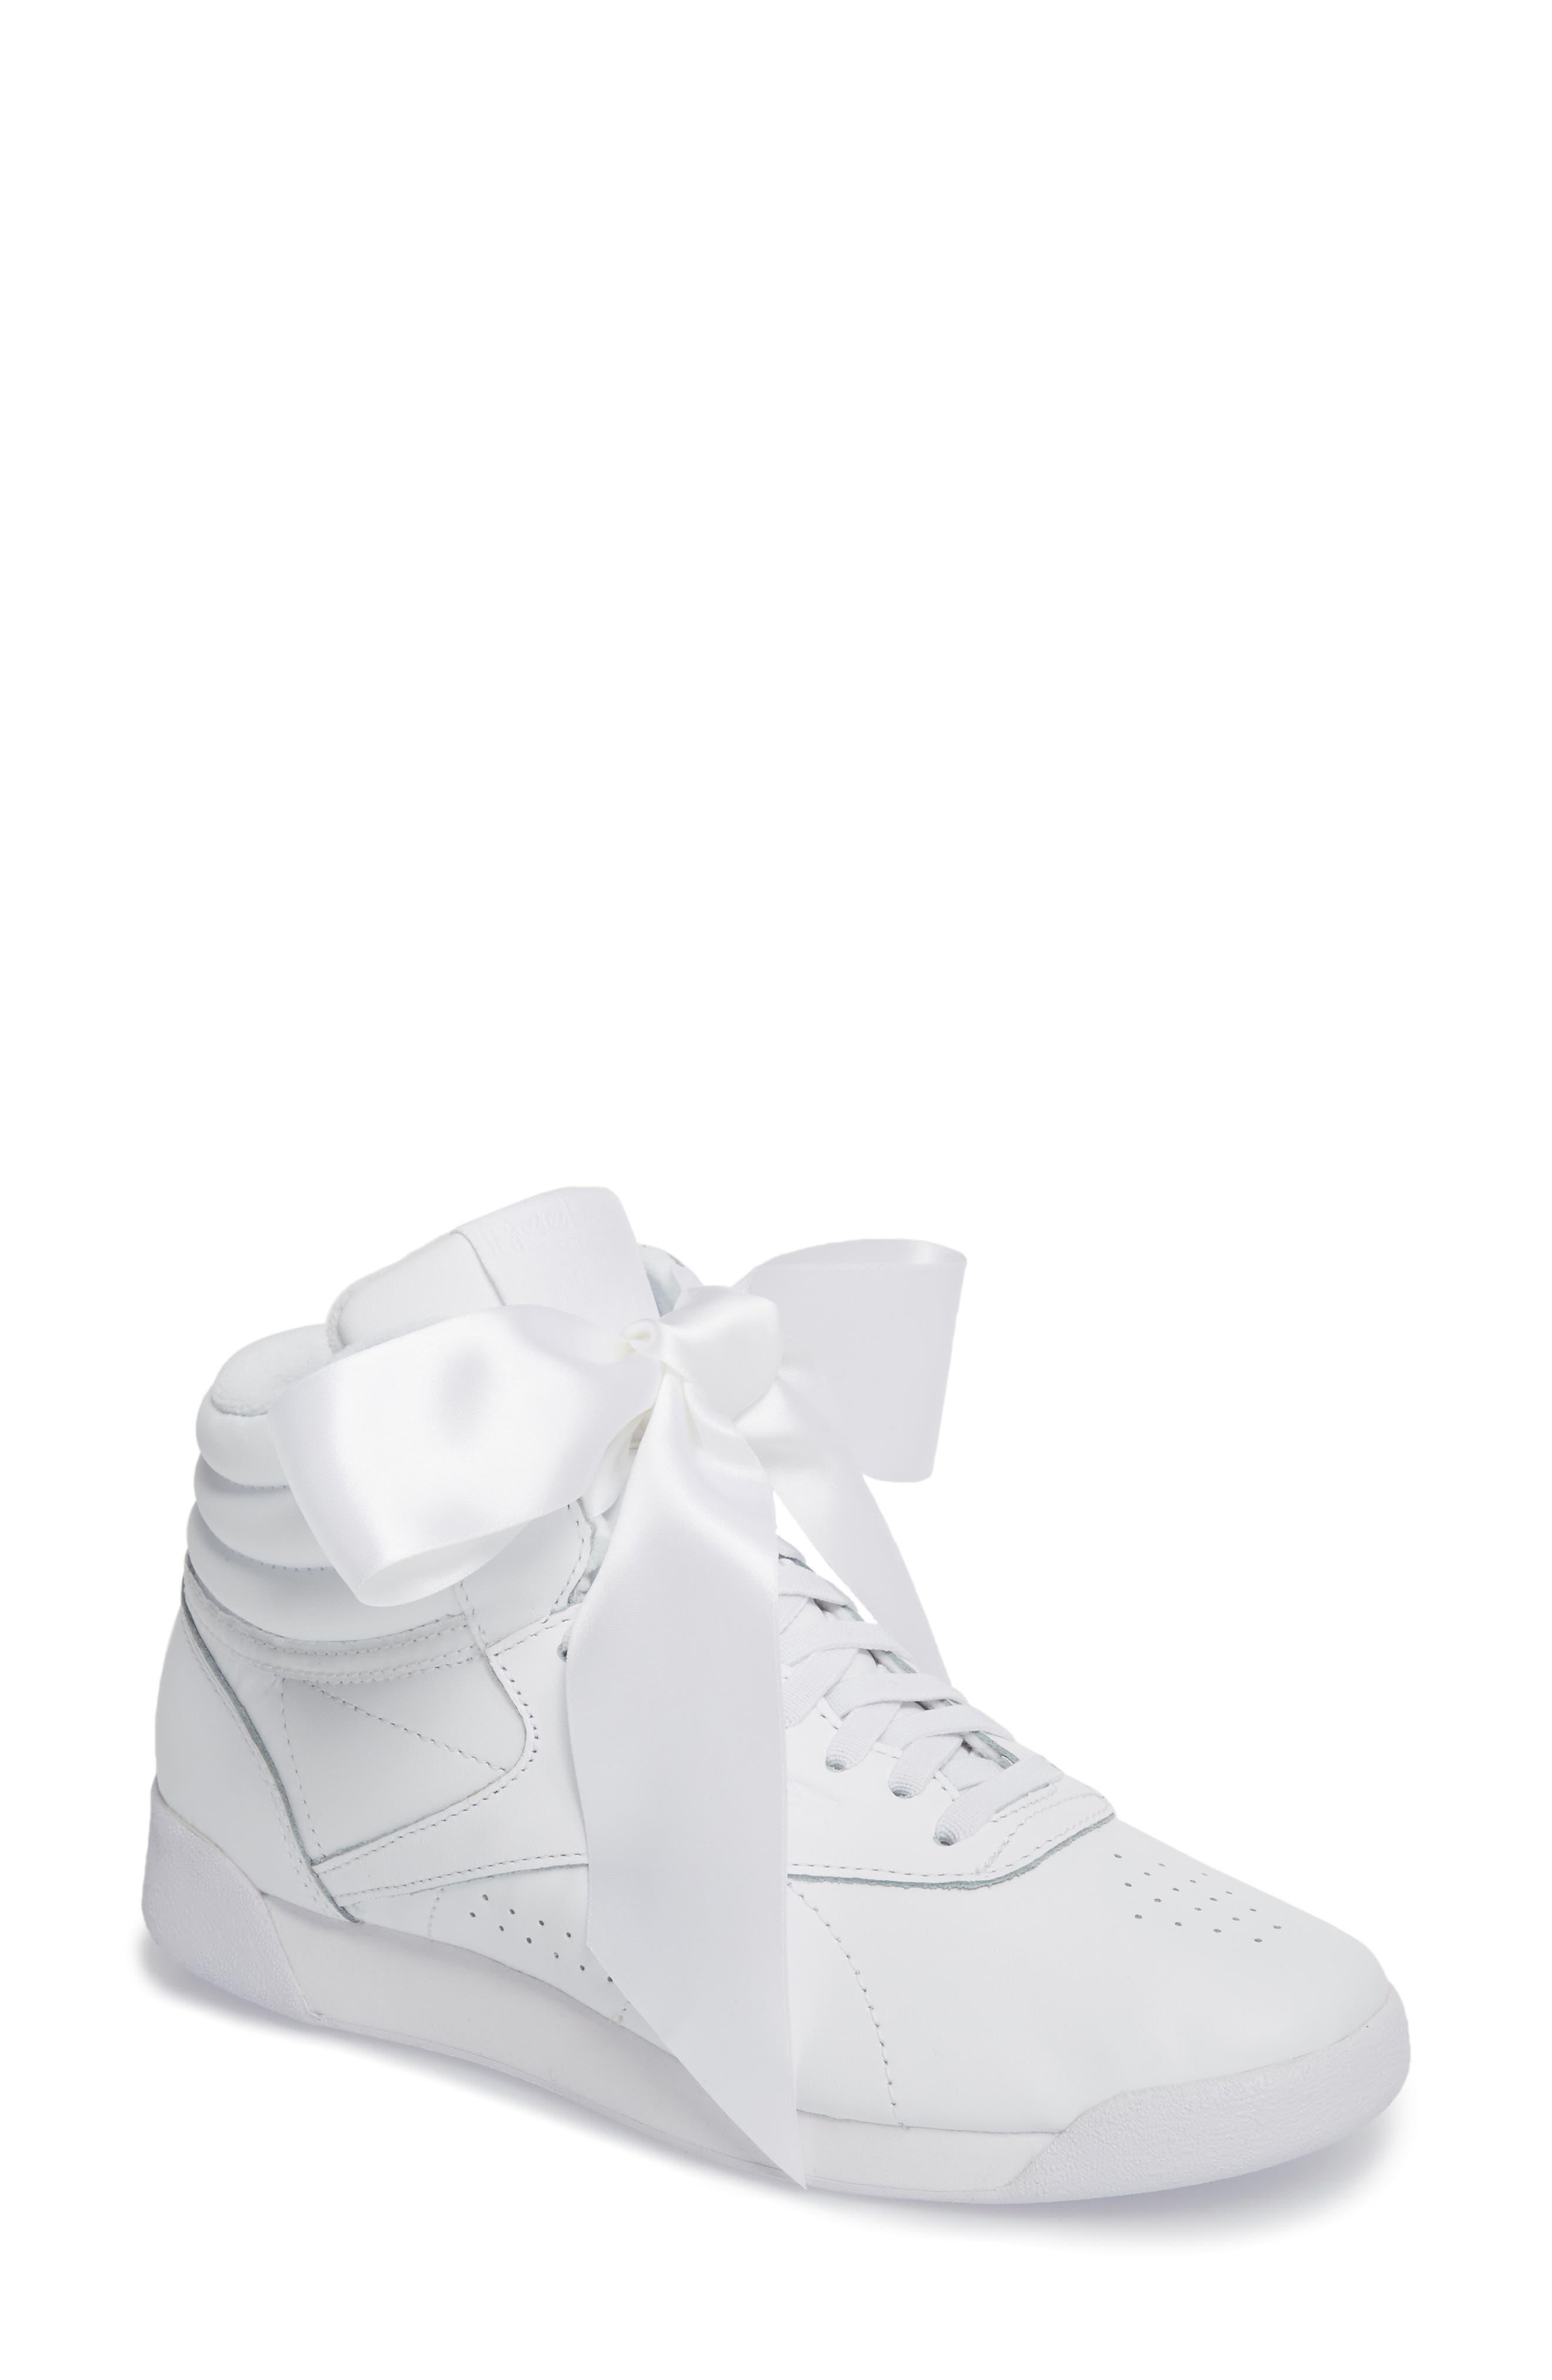 Freestyle Hi Satin Bow Sneaker,                             Main thumbnail 1, color,                             White/ Skull Grey